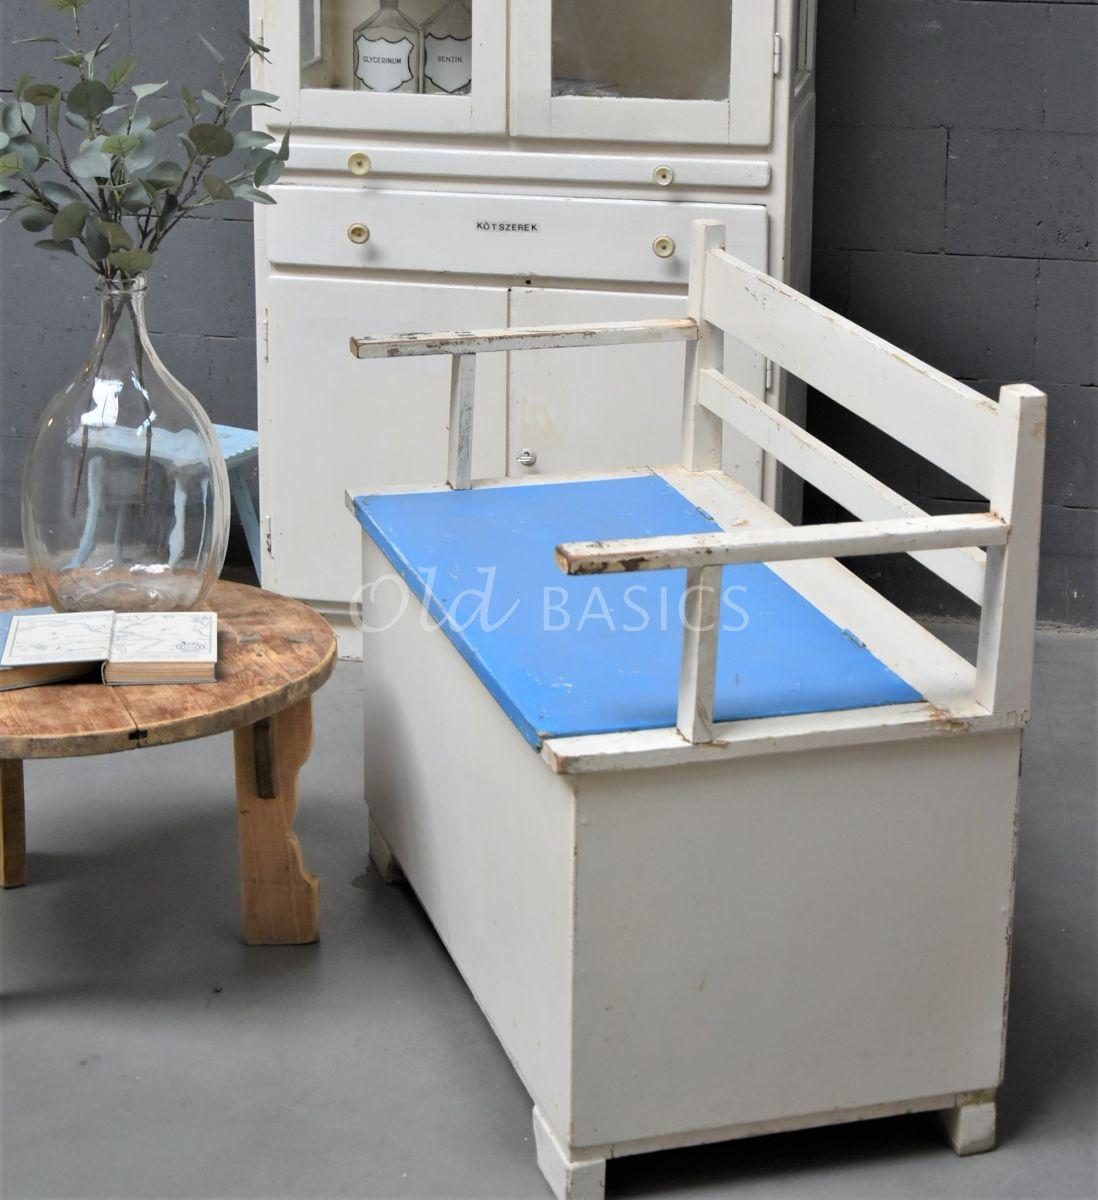 Detail van Klepbank, wit, blauw, materiaal hout